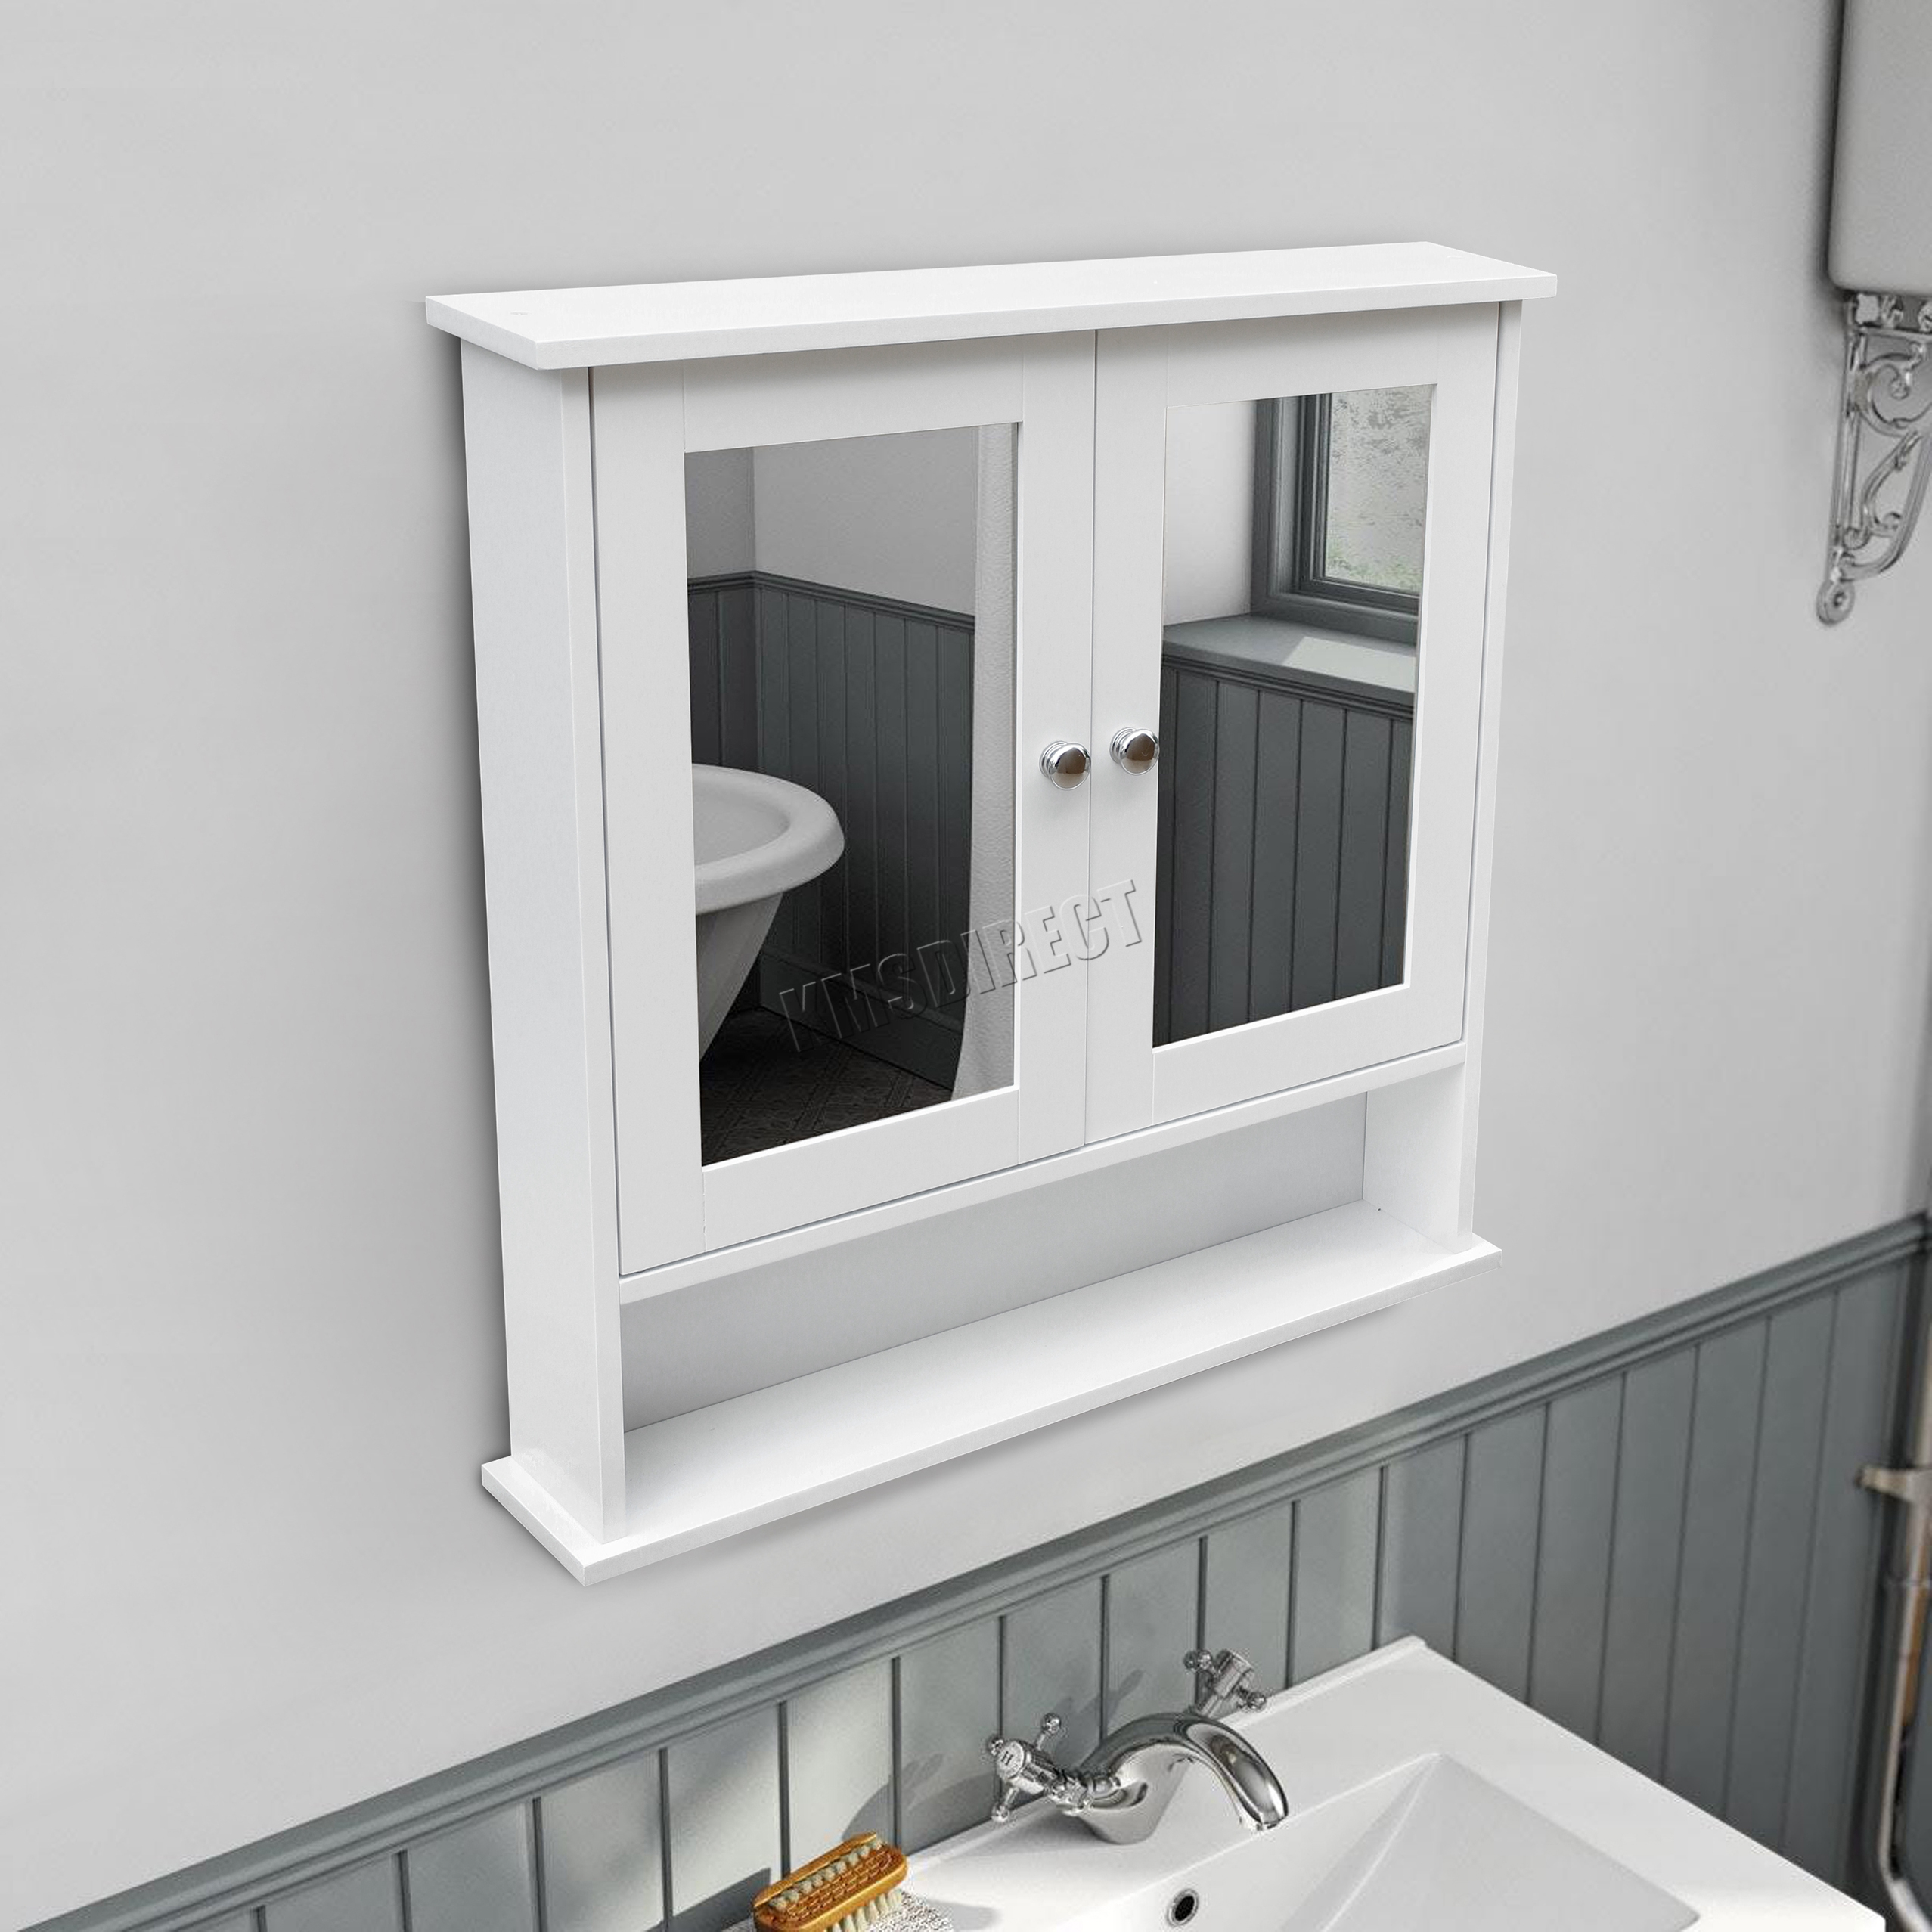 Foxhunter support mural miroir meuble salle bain unit for Placard salle de bain miroir